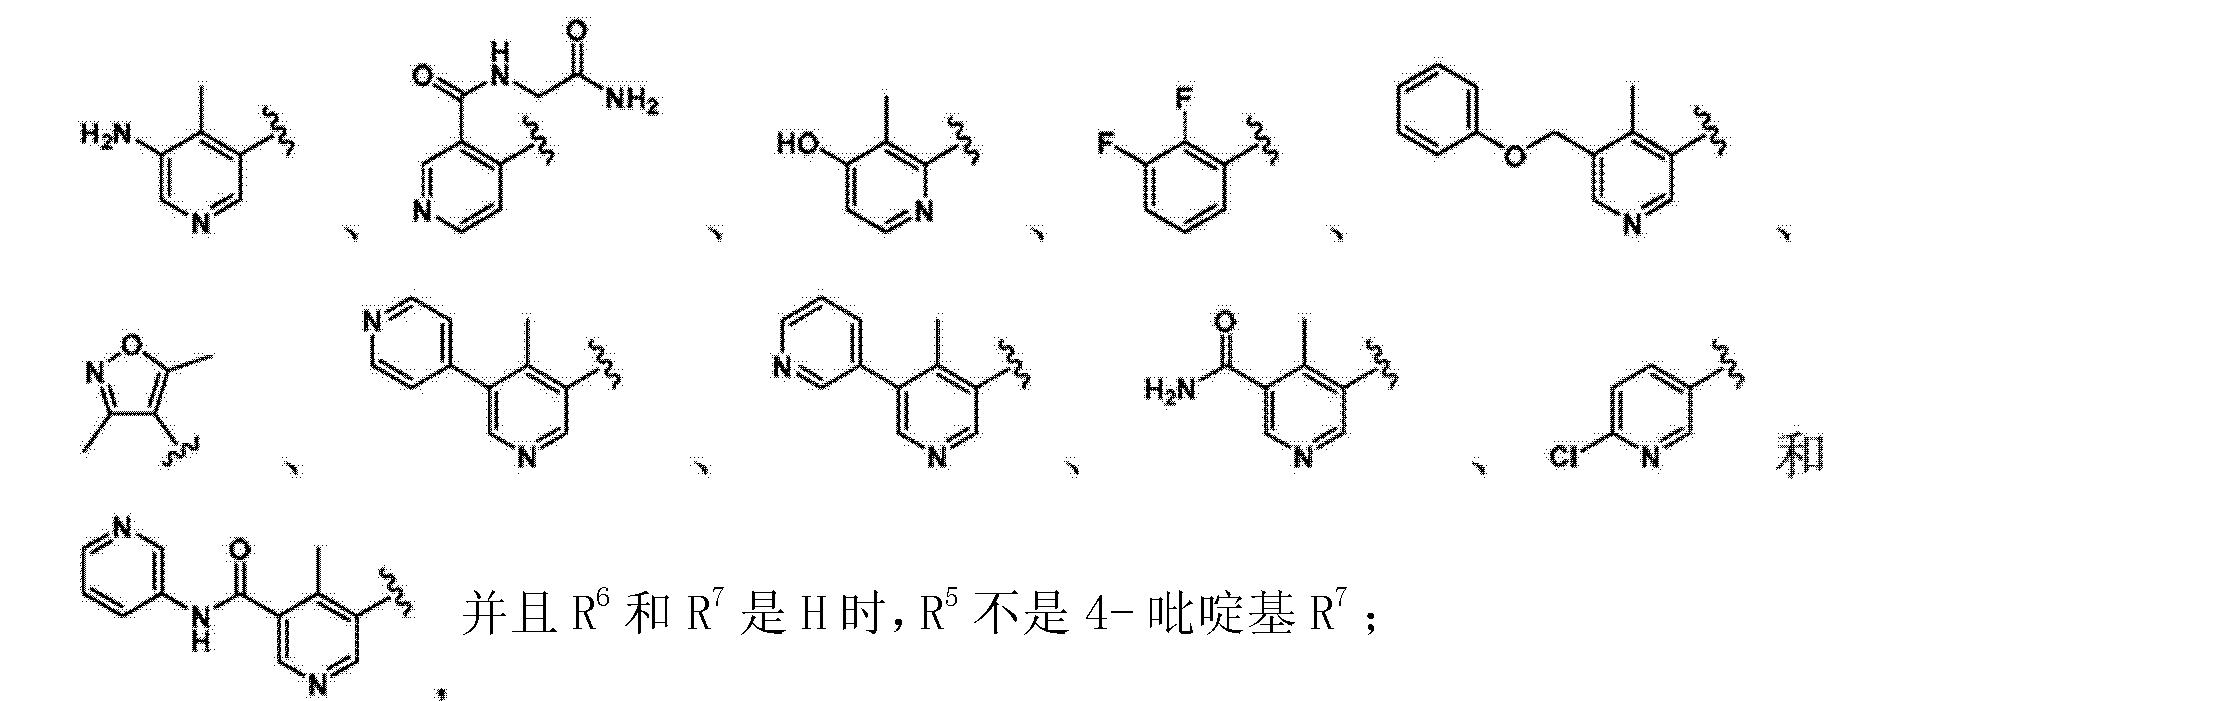 Figure CN103929963AD00742